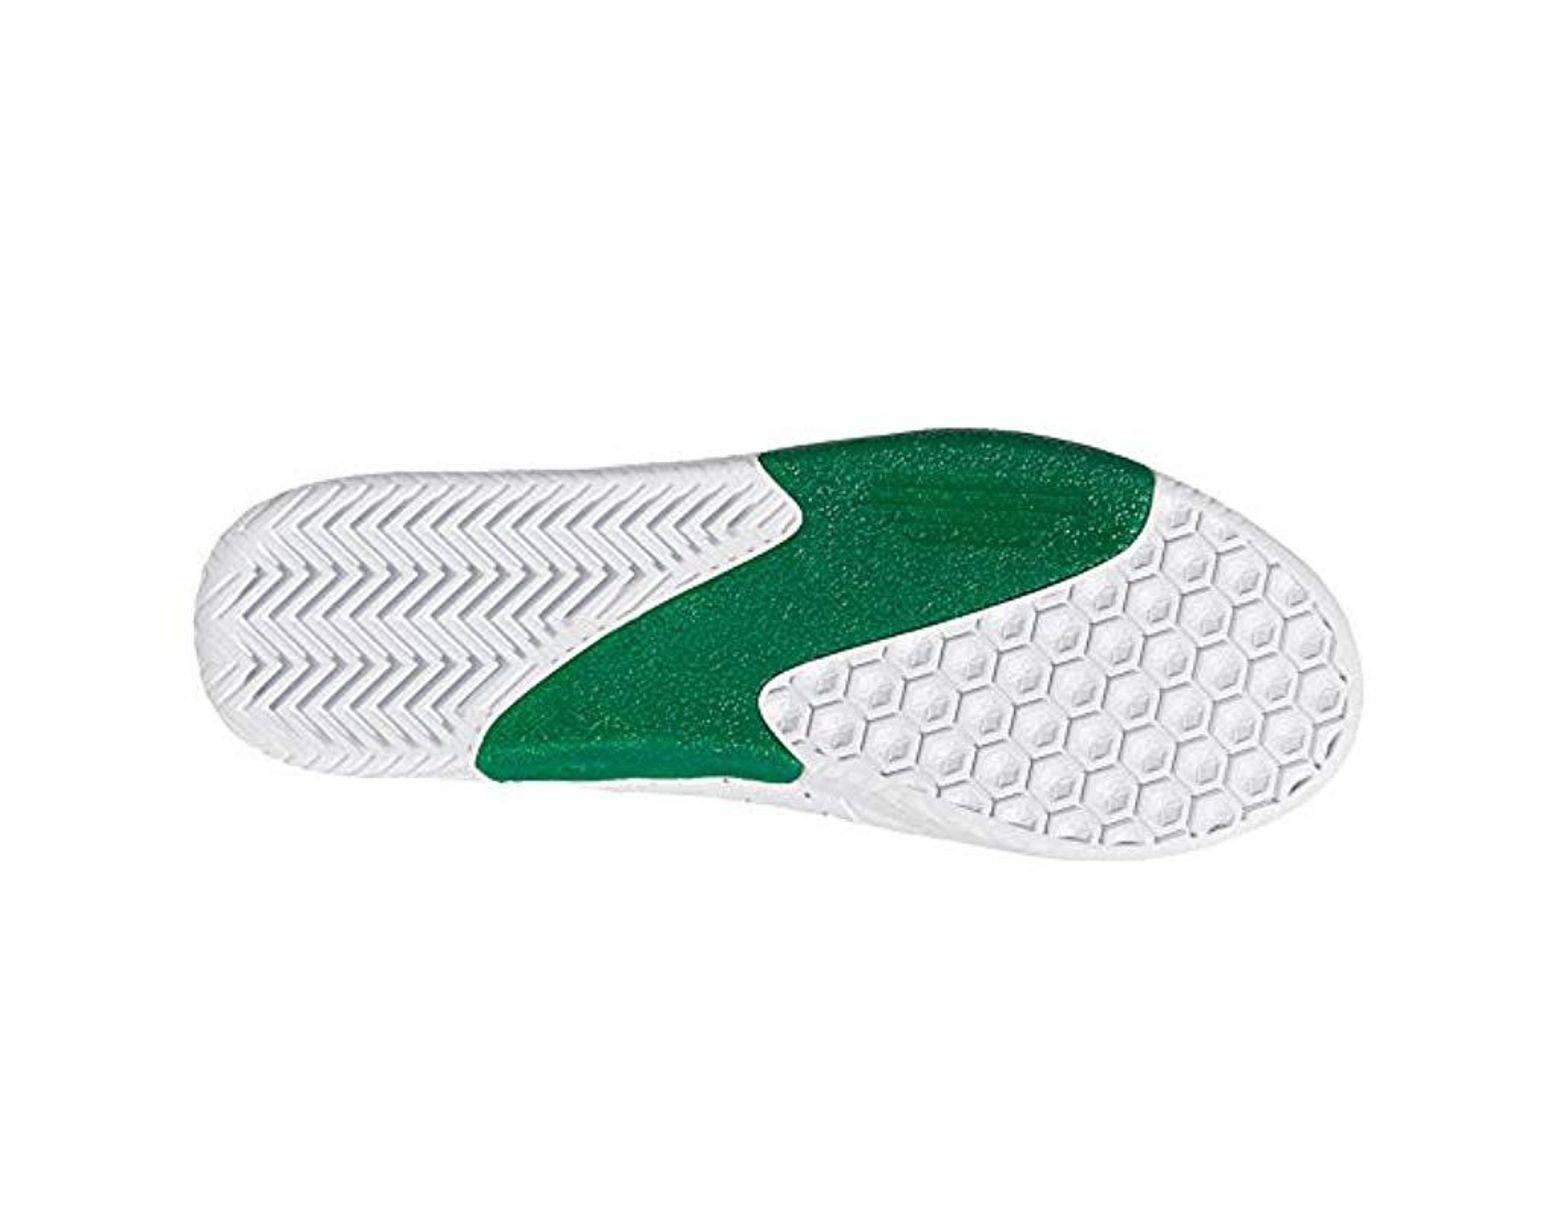 4940b7803e0fd adidas 3st.003 X Nakel Footwear White/bold Green/bold Gold in Green ...